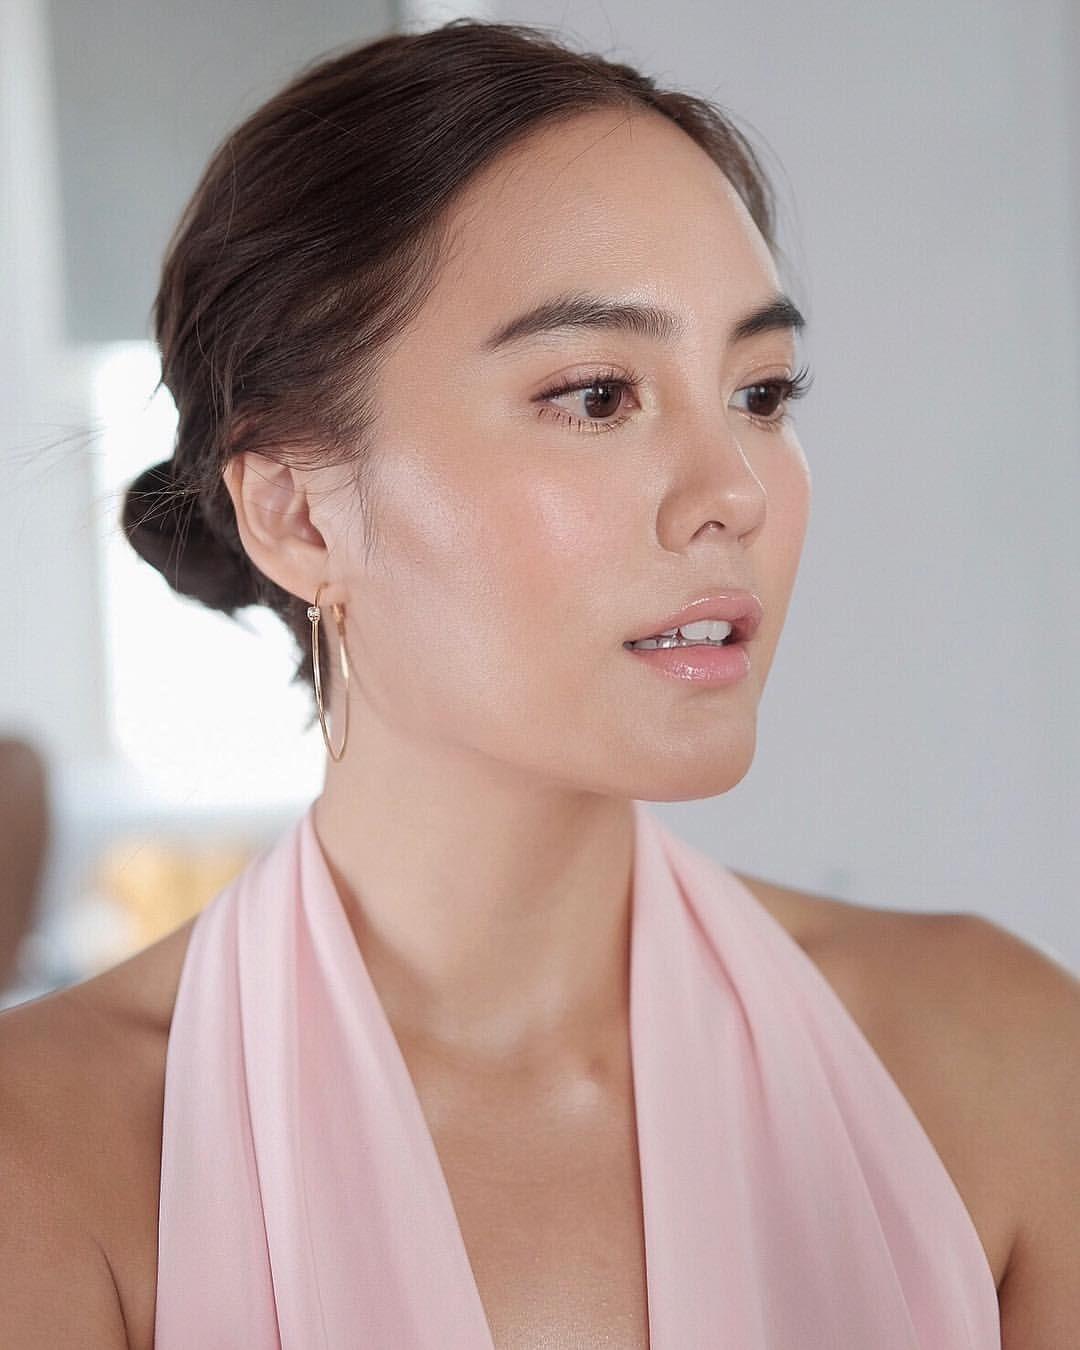 Instagram Janie Tienphosuwan naked photo 2017